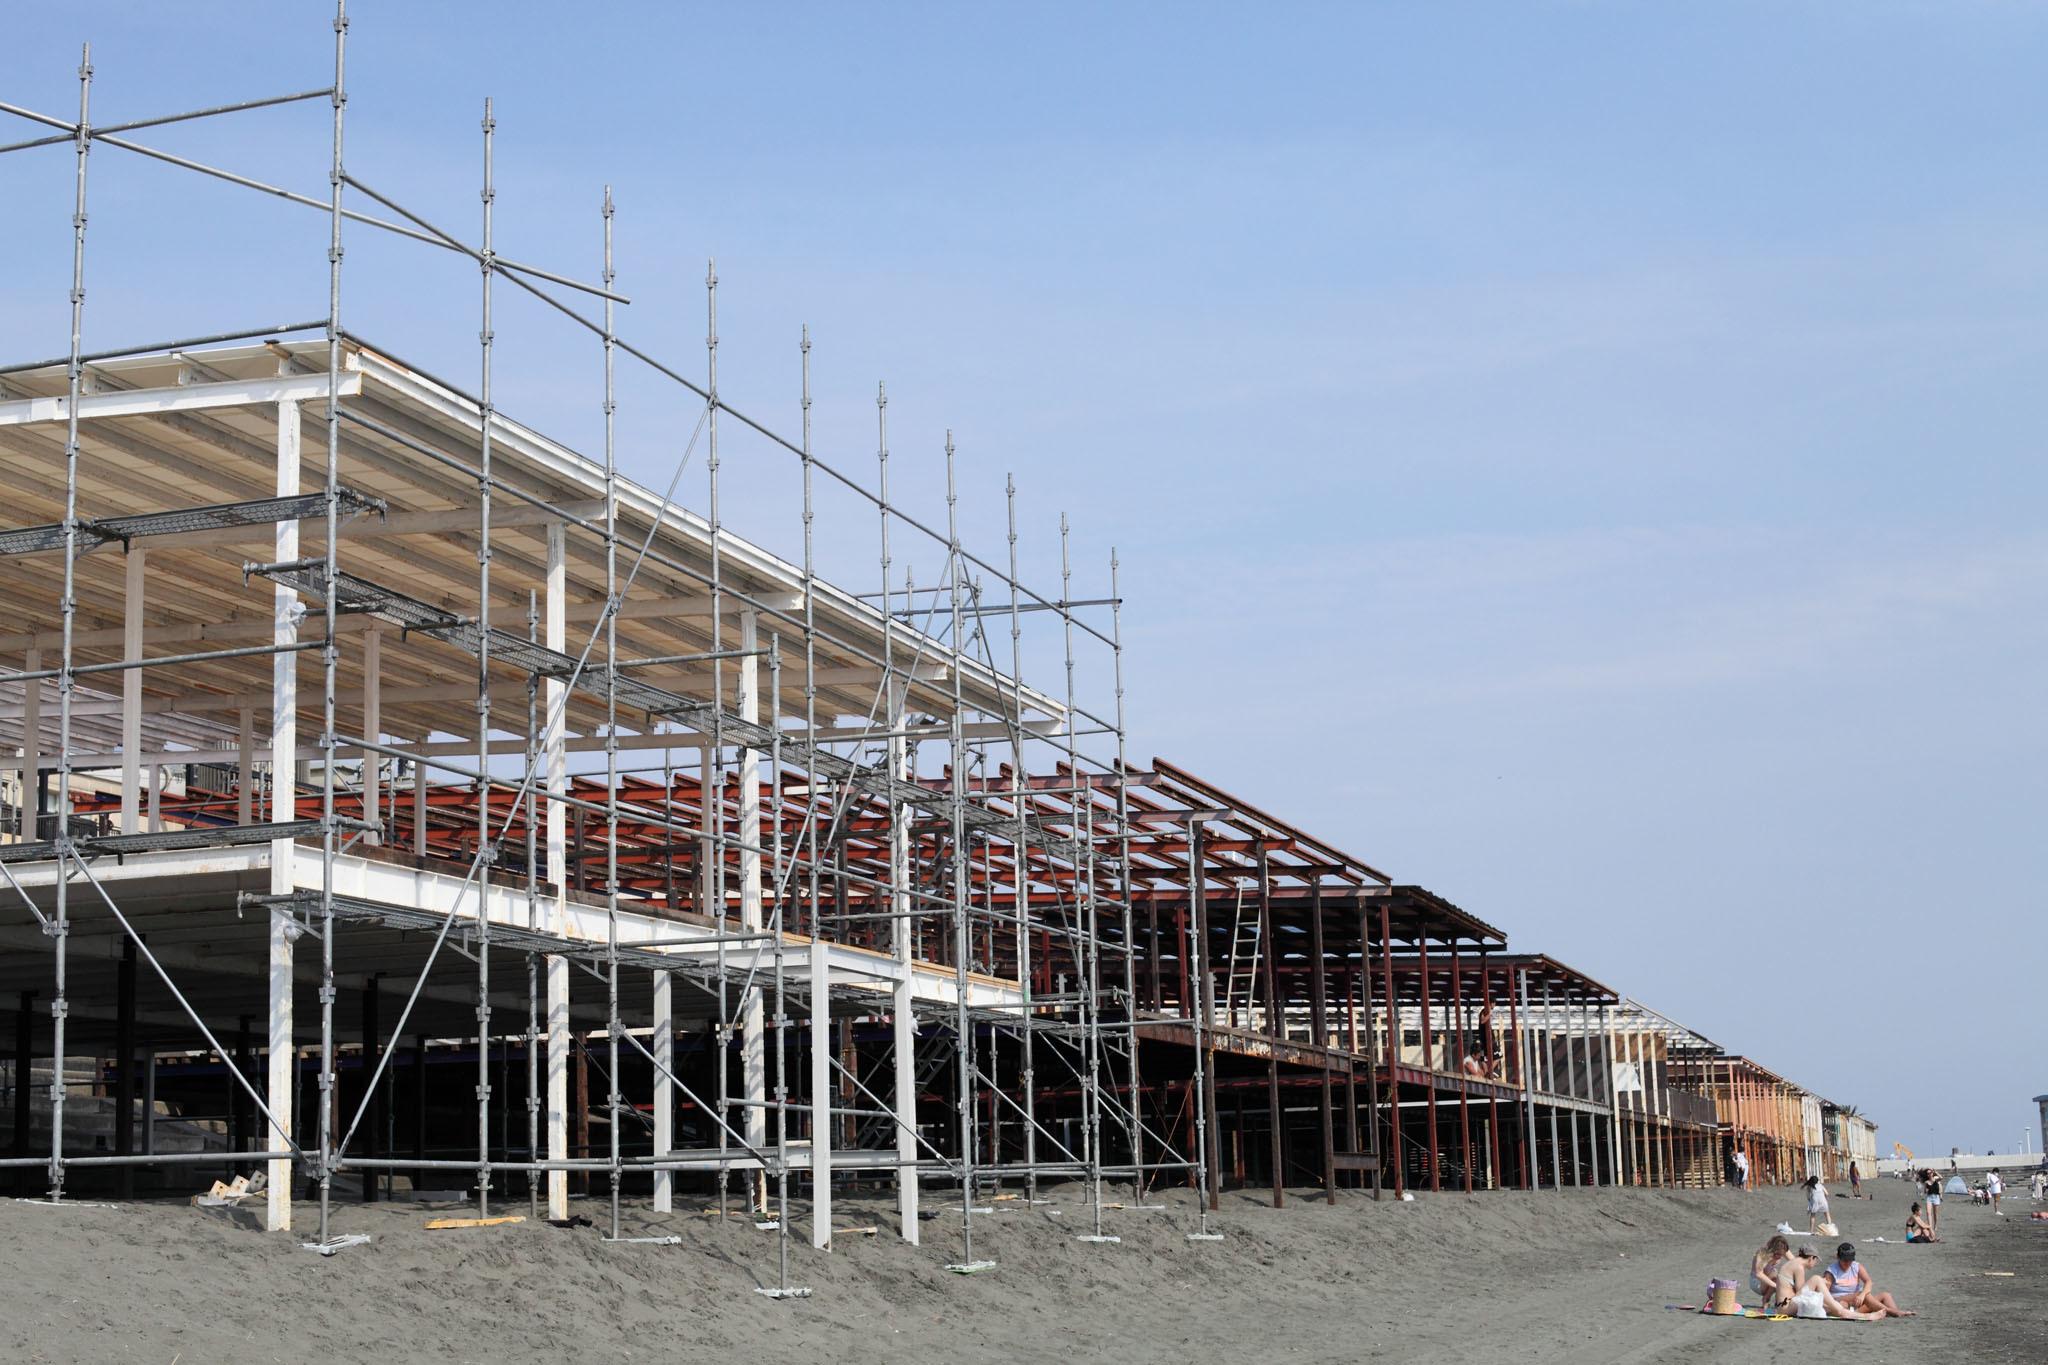 海の家建設中_c0299360_23453878.jpg